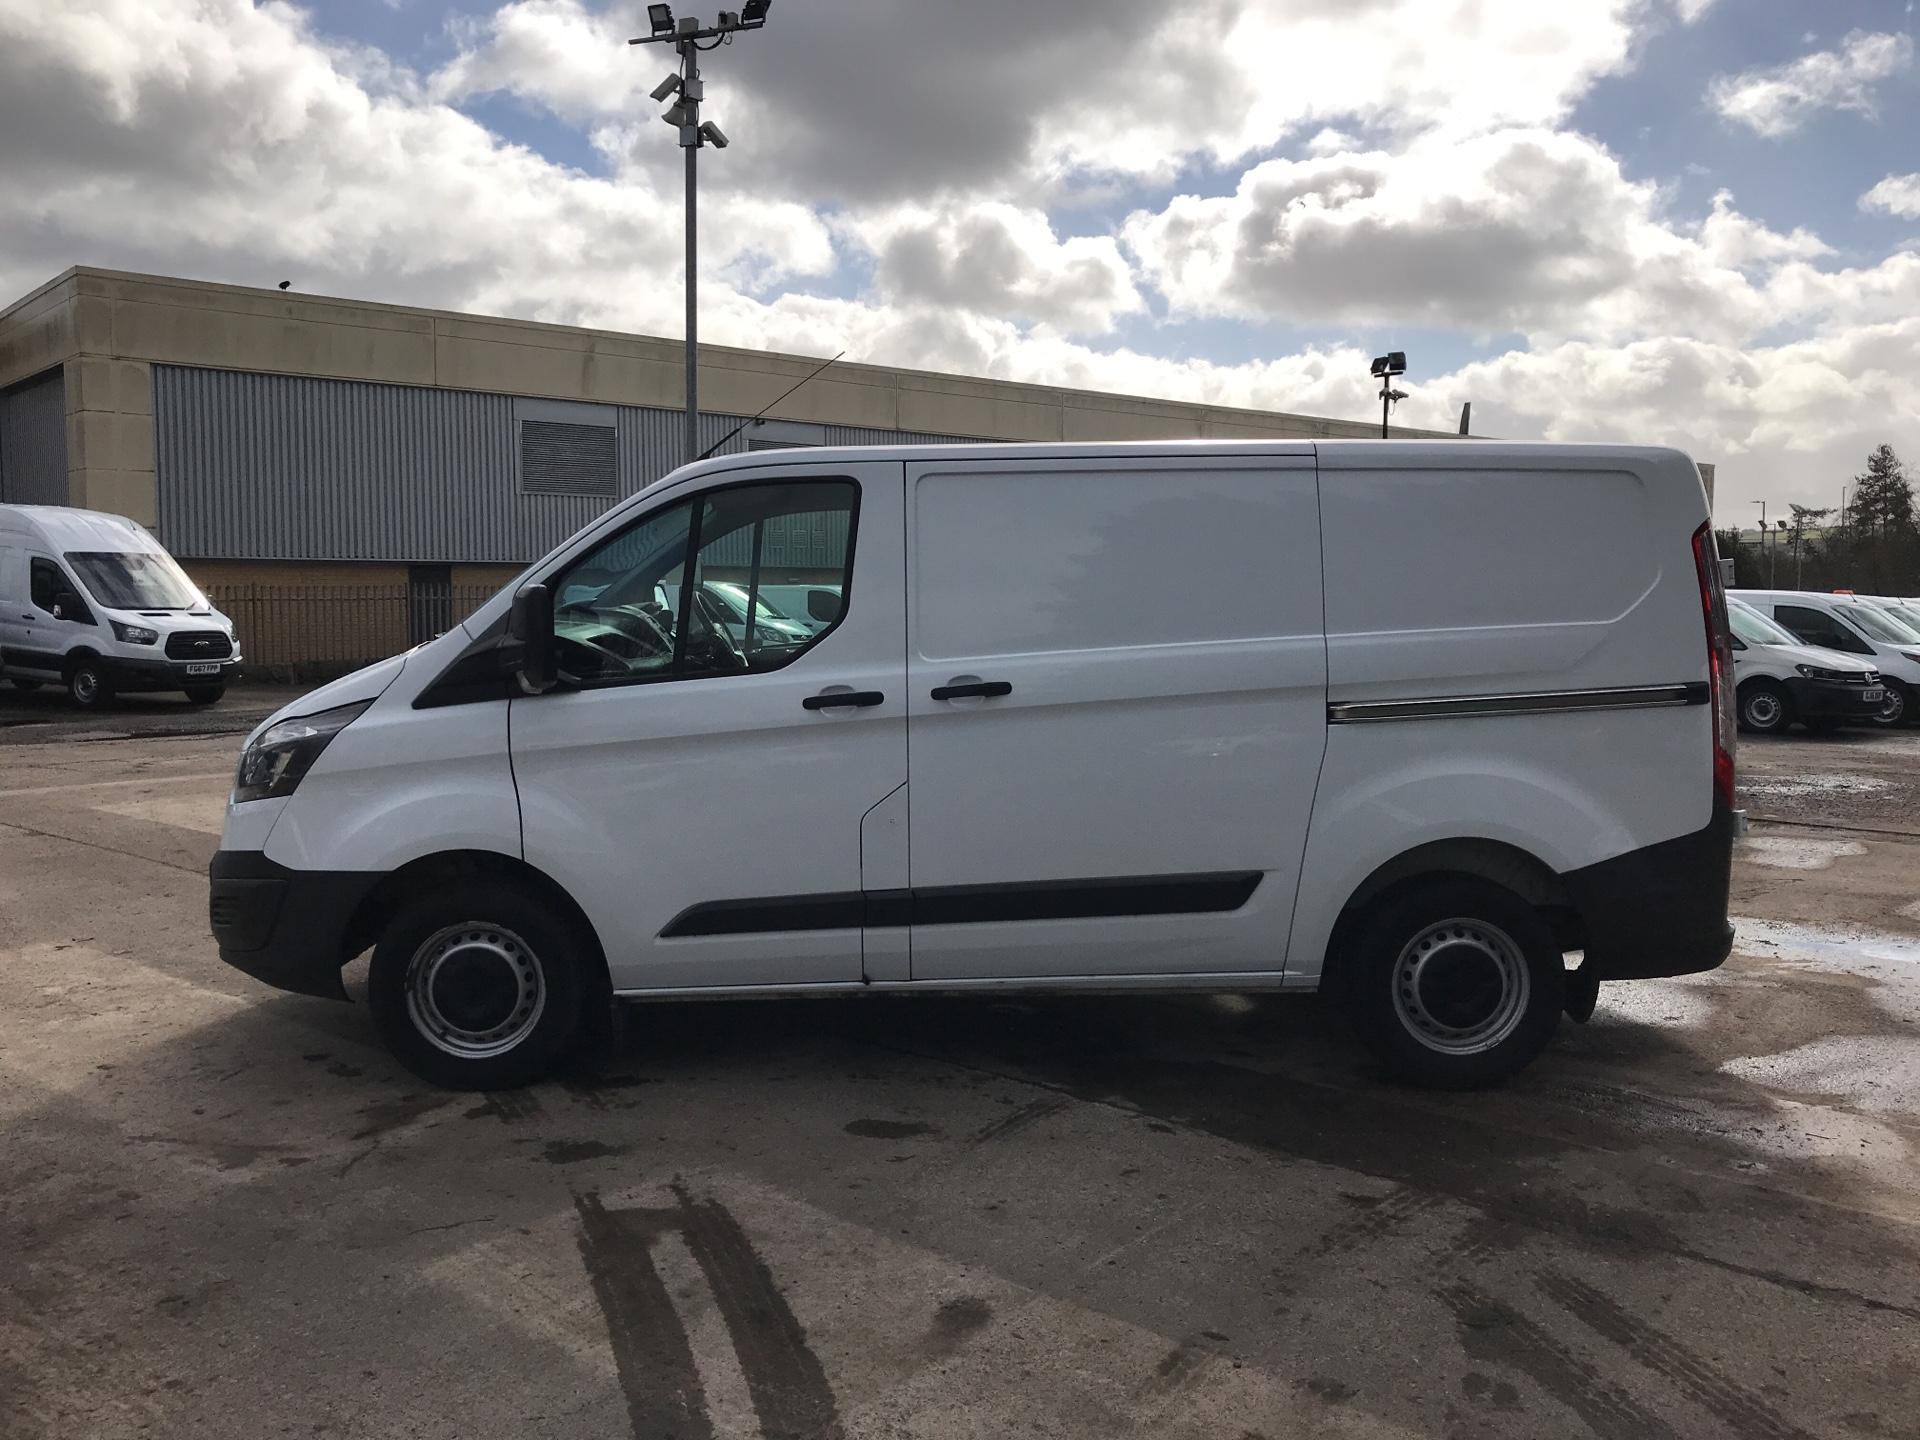 2017 Ford Transit Custom 290 L1 DIESEL FWD 2.0 TDCI 105PS LOW ROOF VAN EURO 6 (BN17OZL) Image 6